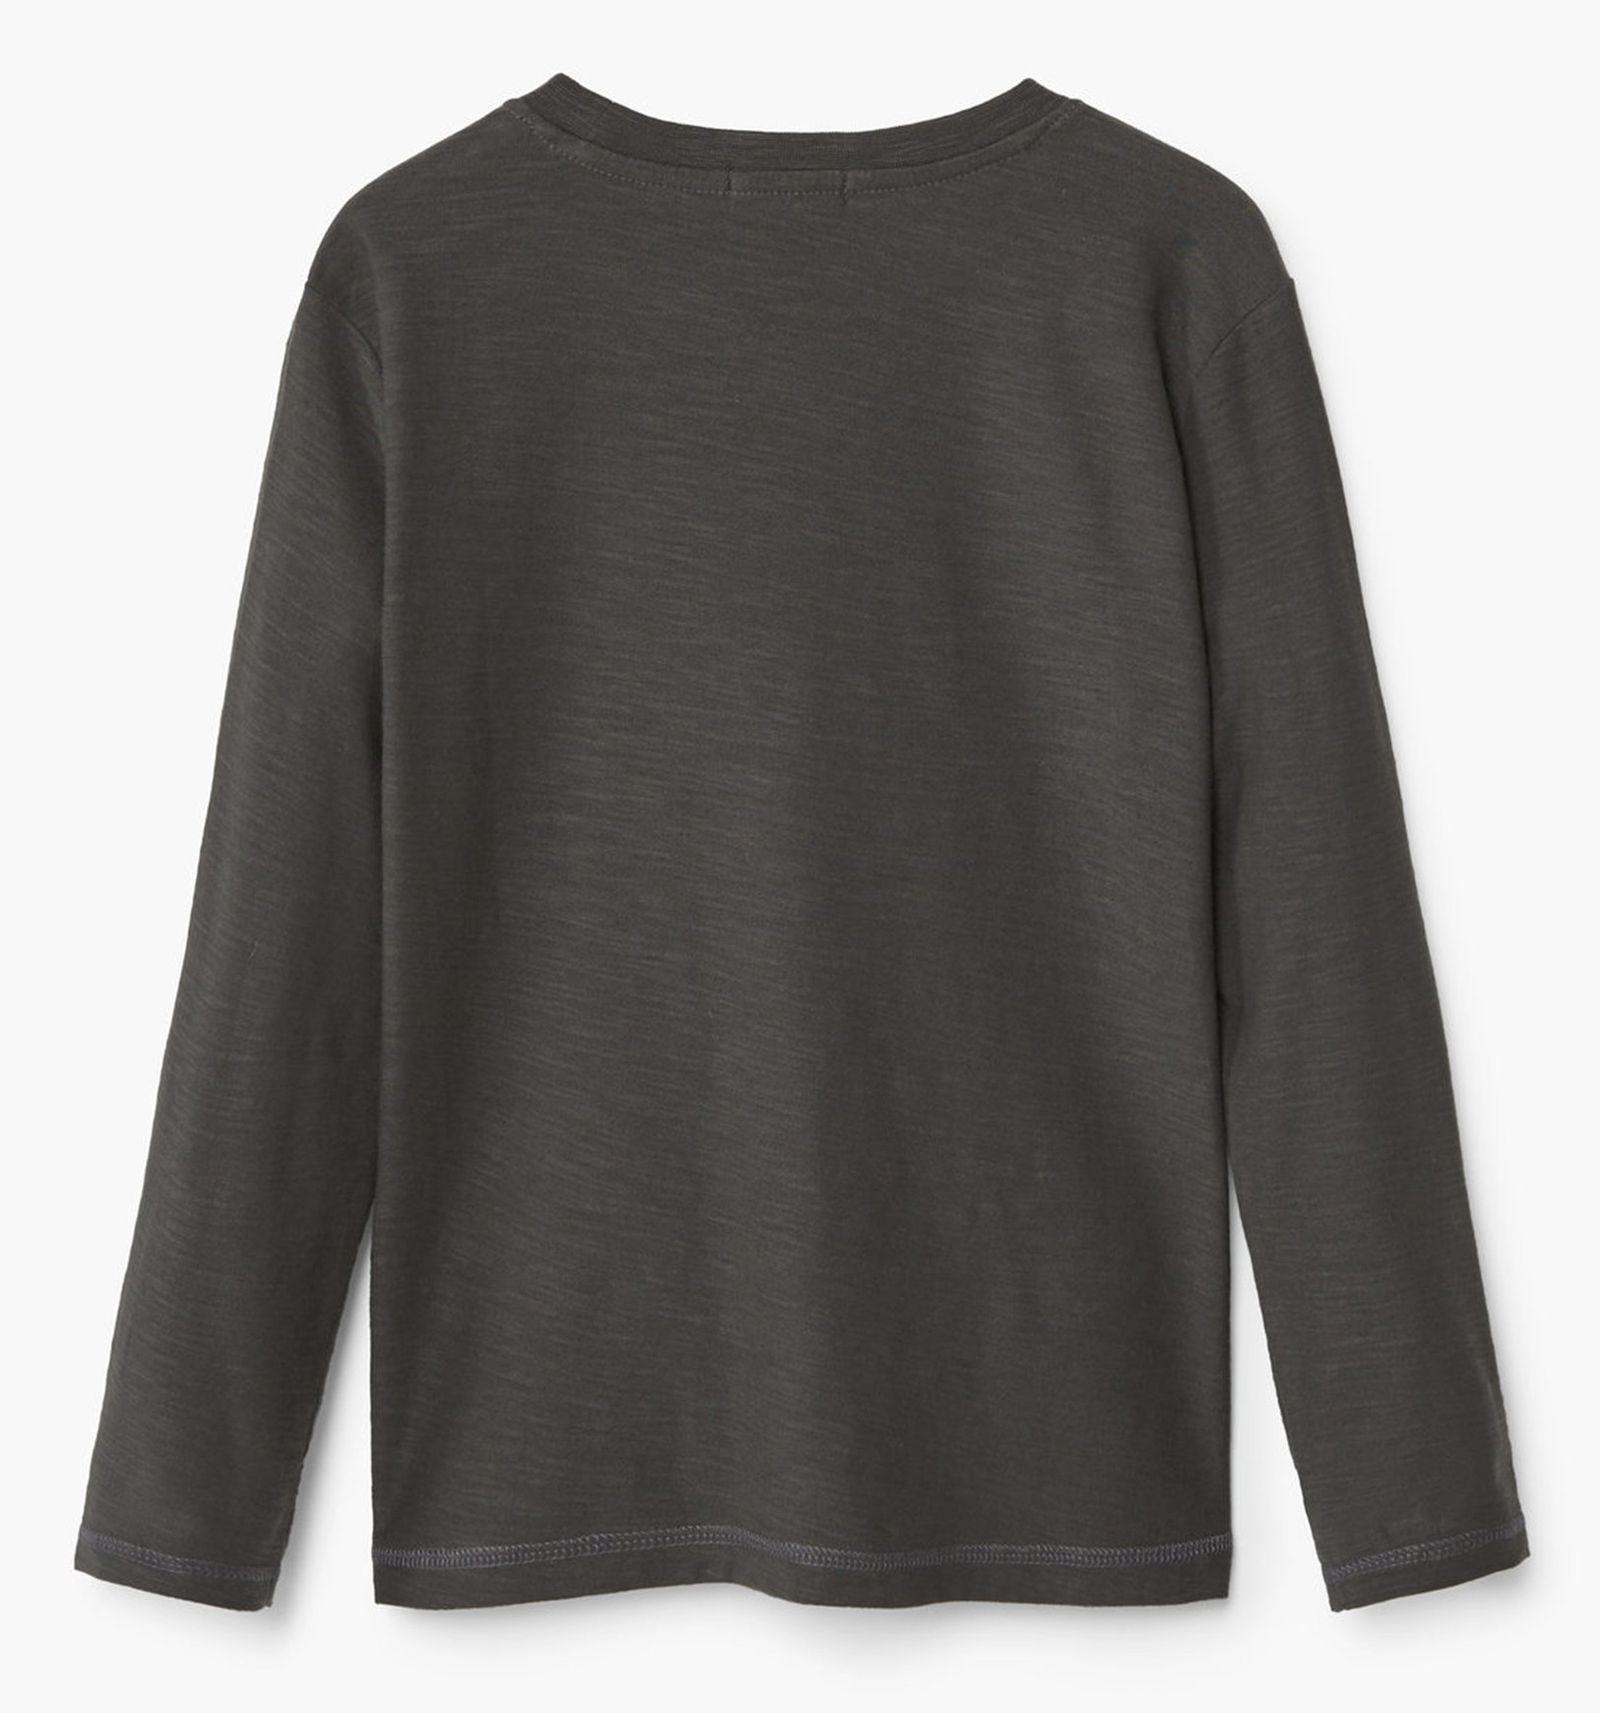 تی شرت نخی پسرانه - مانگو - طوسي تيره - 2